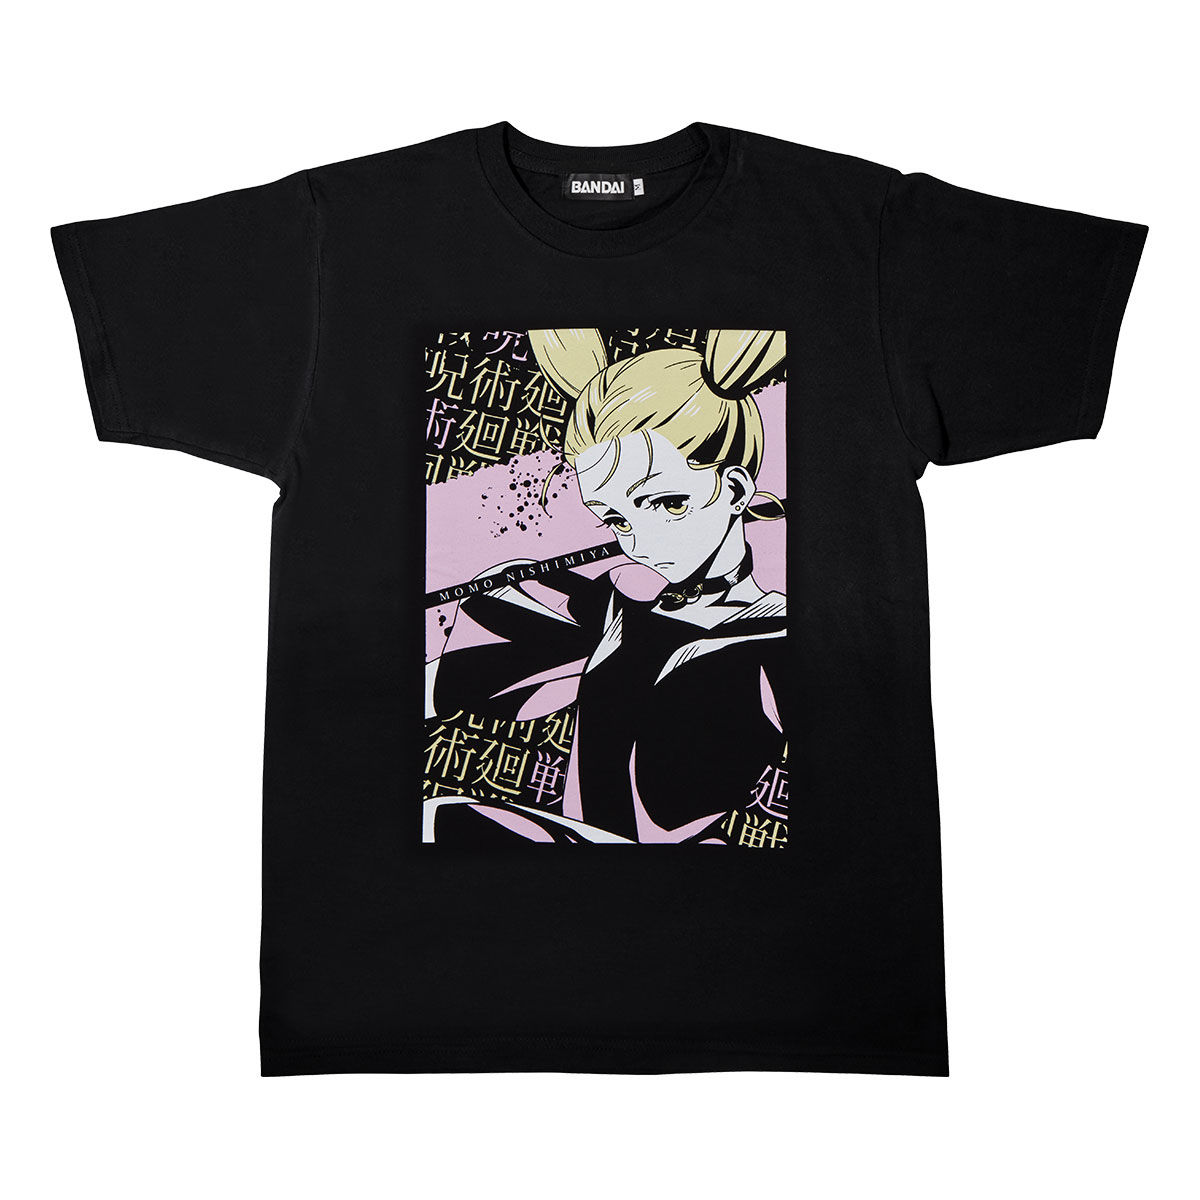 Jujutsu Kaisen T-shirt collection III